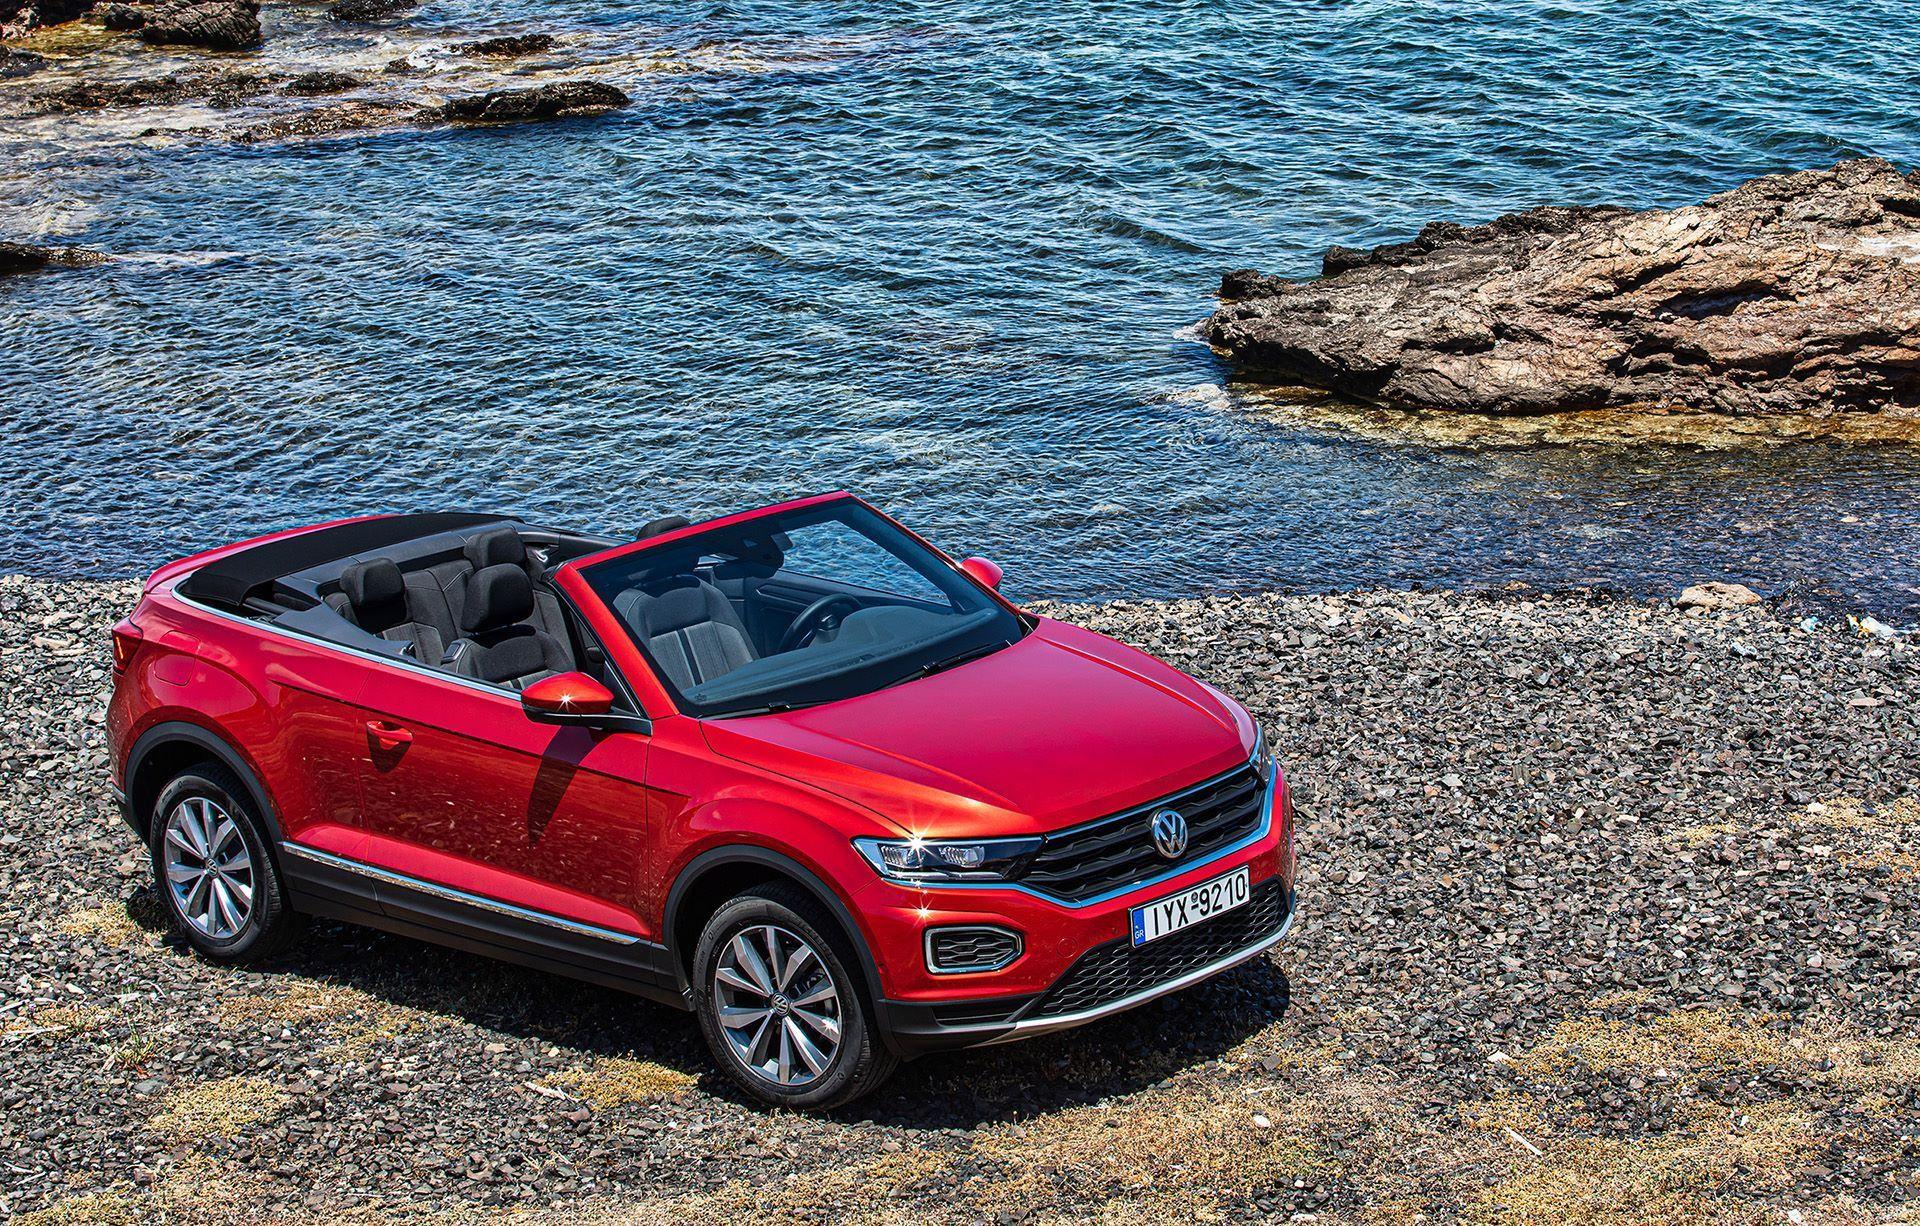 Volkswagen-T-Roc-Cabriolet-Greece-28